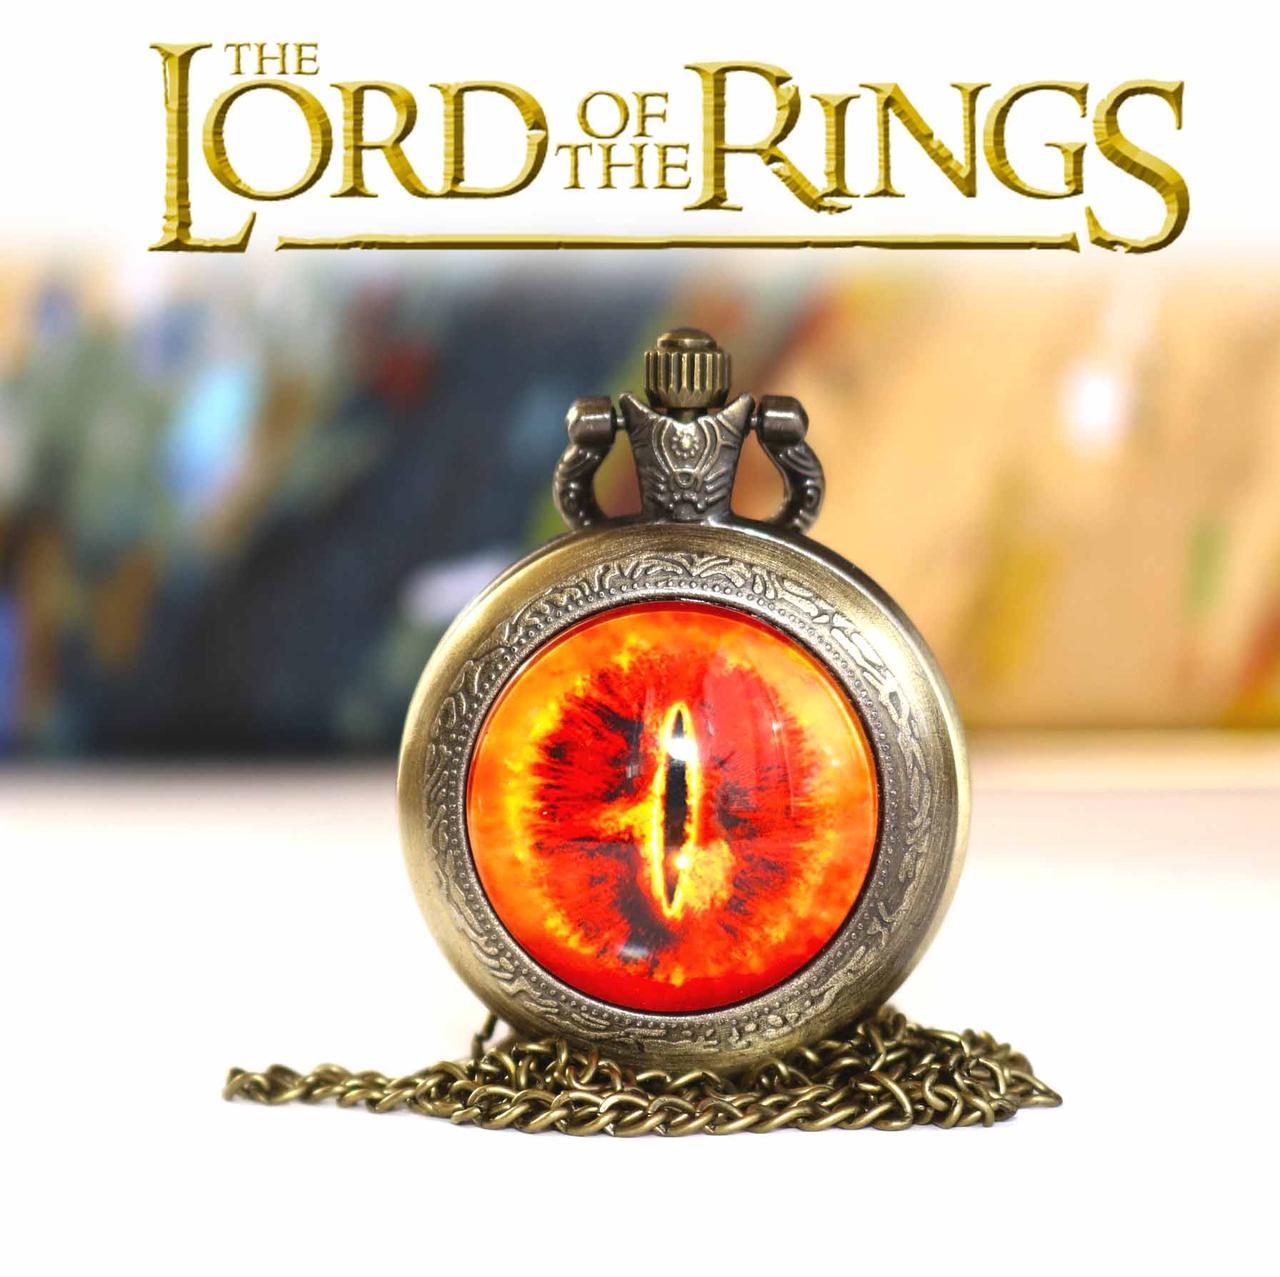 Карманные часы Око Саурона Властелин колец / The Lord of the Rings